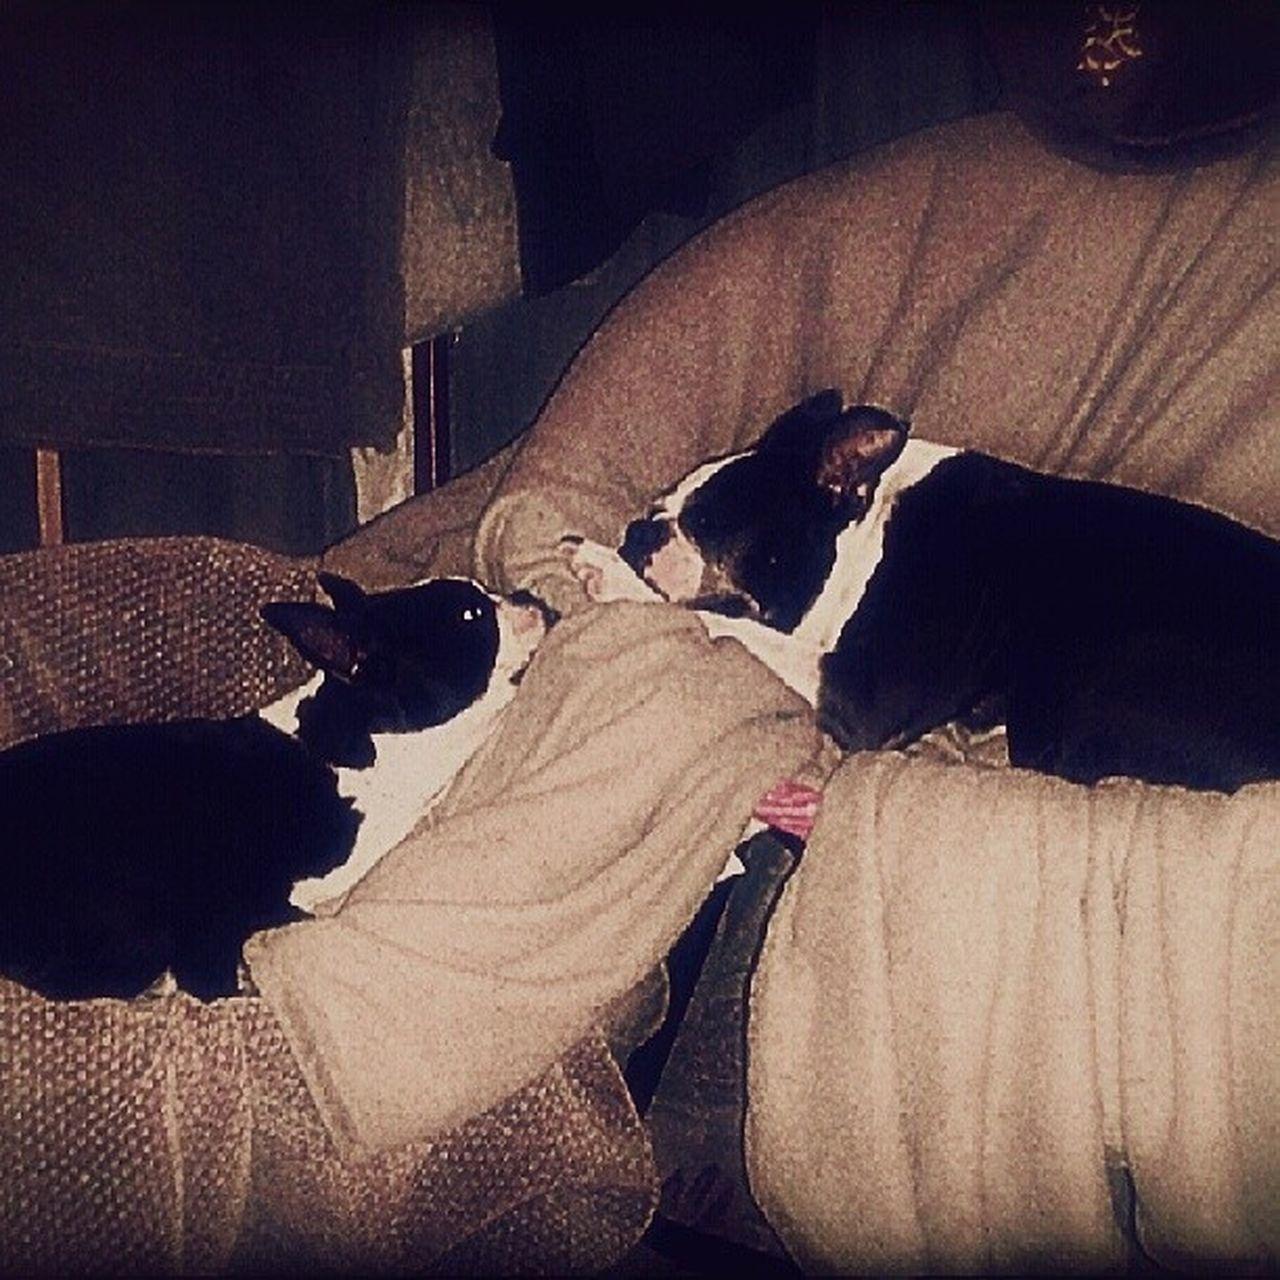 Instapuppy Terriors Animals Sleepy Instagramaz Phoenixaz Pepper &ella Cute Adorable Sisters Naptime Instagram Instadog Instalove Instagramhub Iganimals Igersphx Igpuppy Instanaps Puppydreamz Goofballs :)